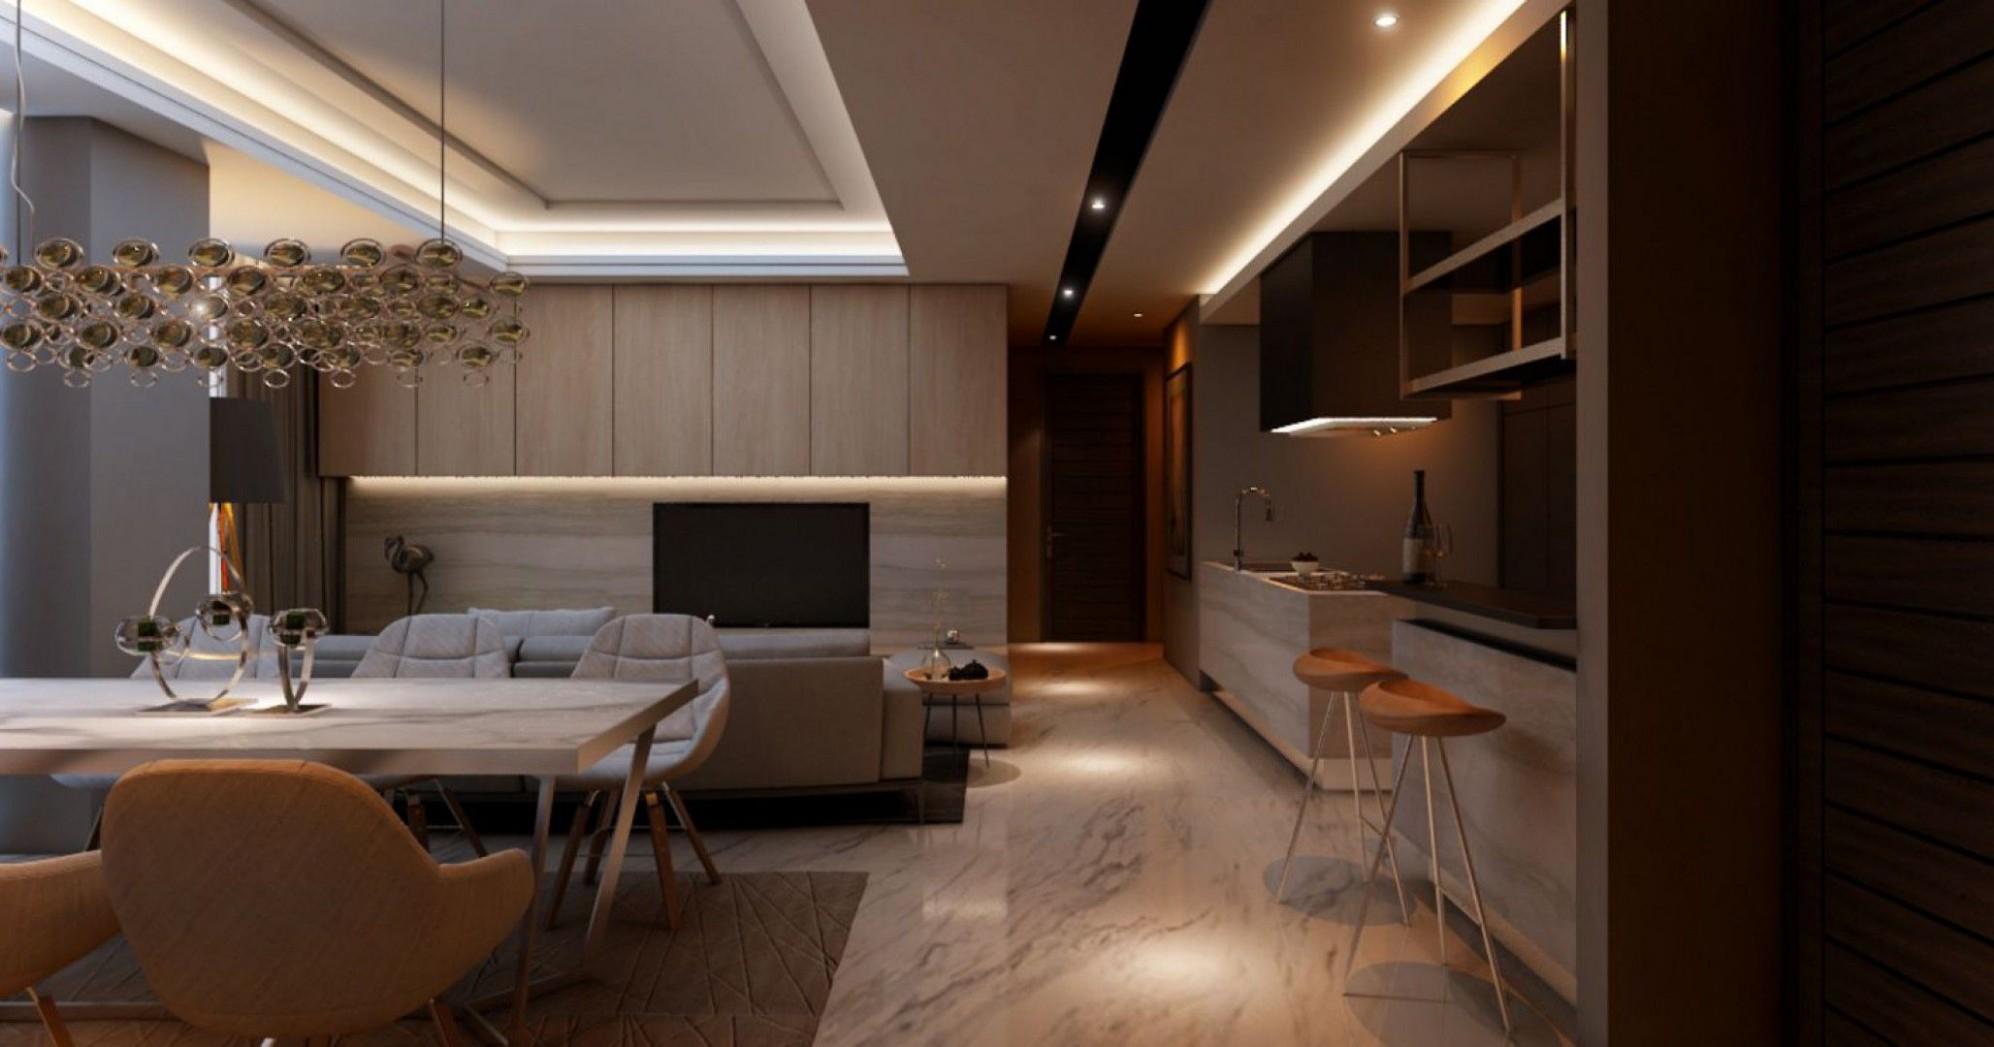 Modern  Spring Hill  Jakarta Pusat  Manna Interior  Apartment  - Apartment Interior Design Jakarta